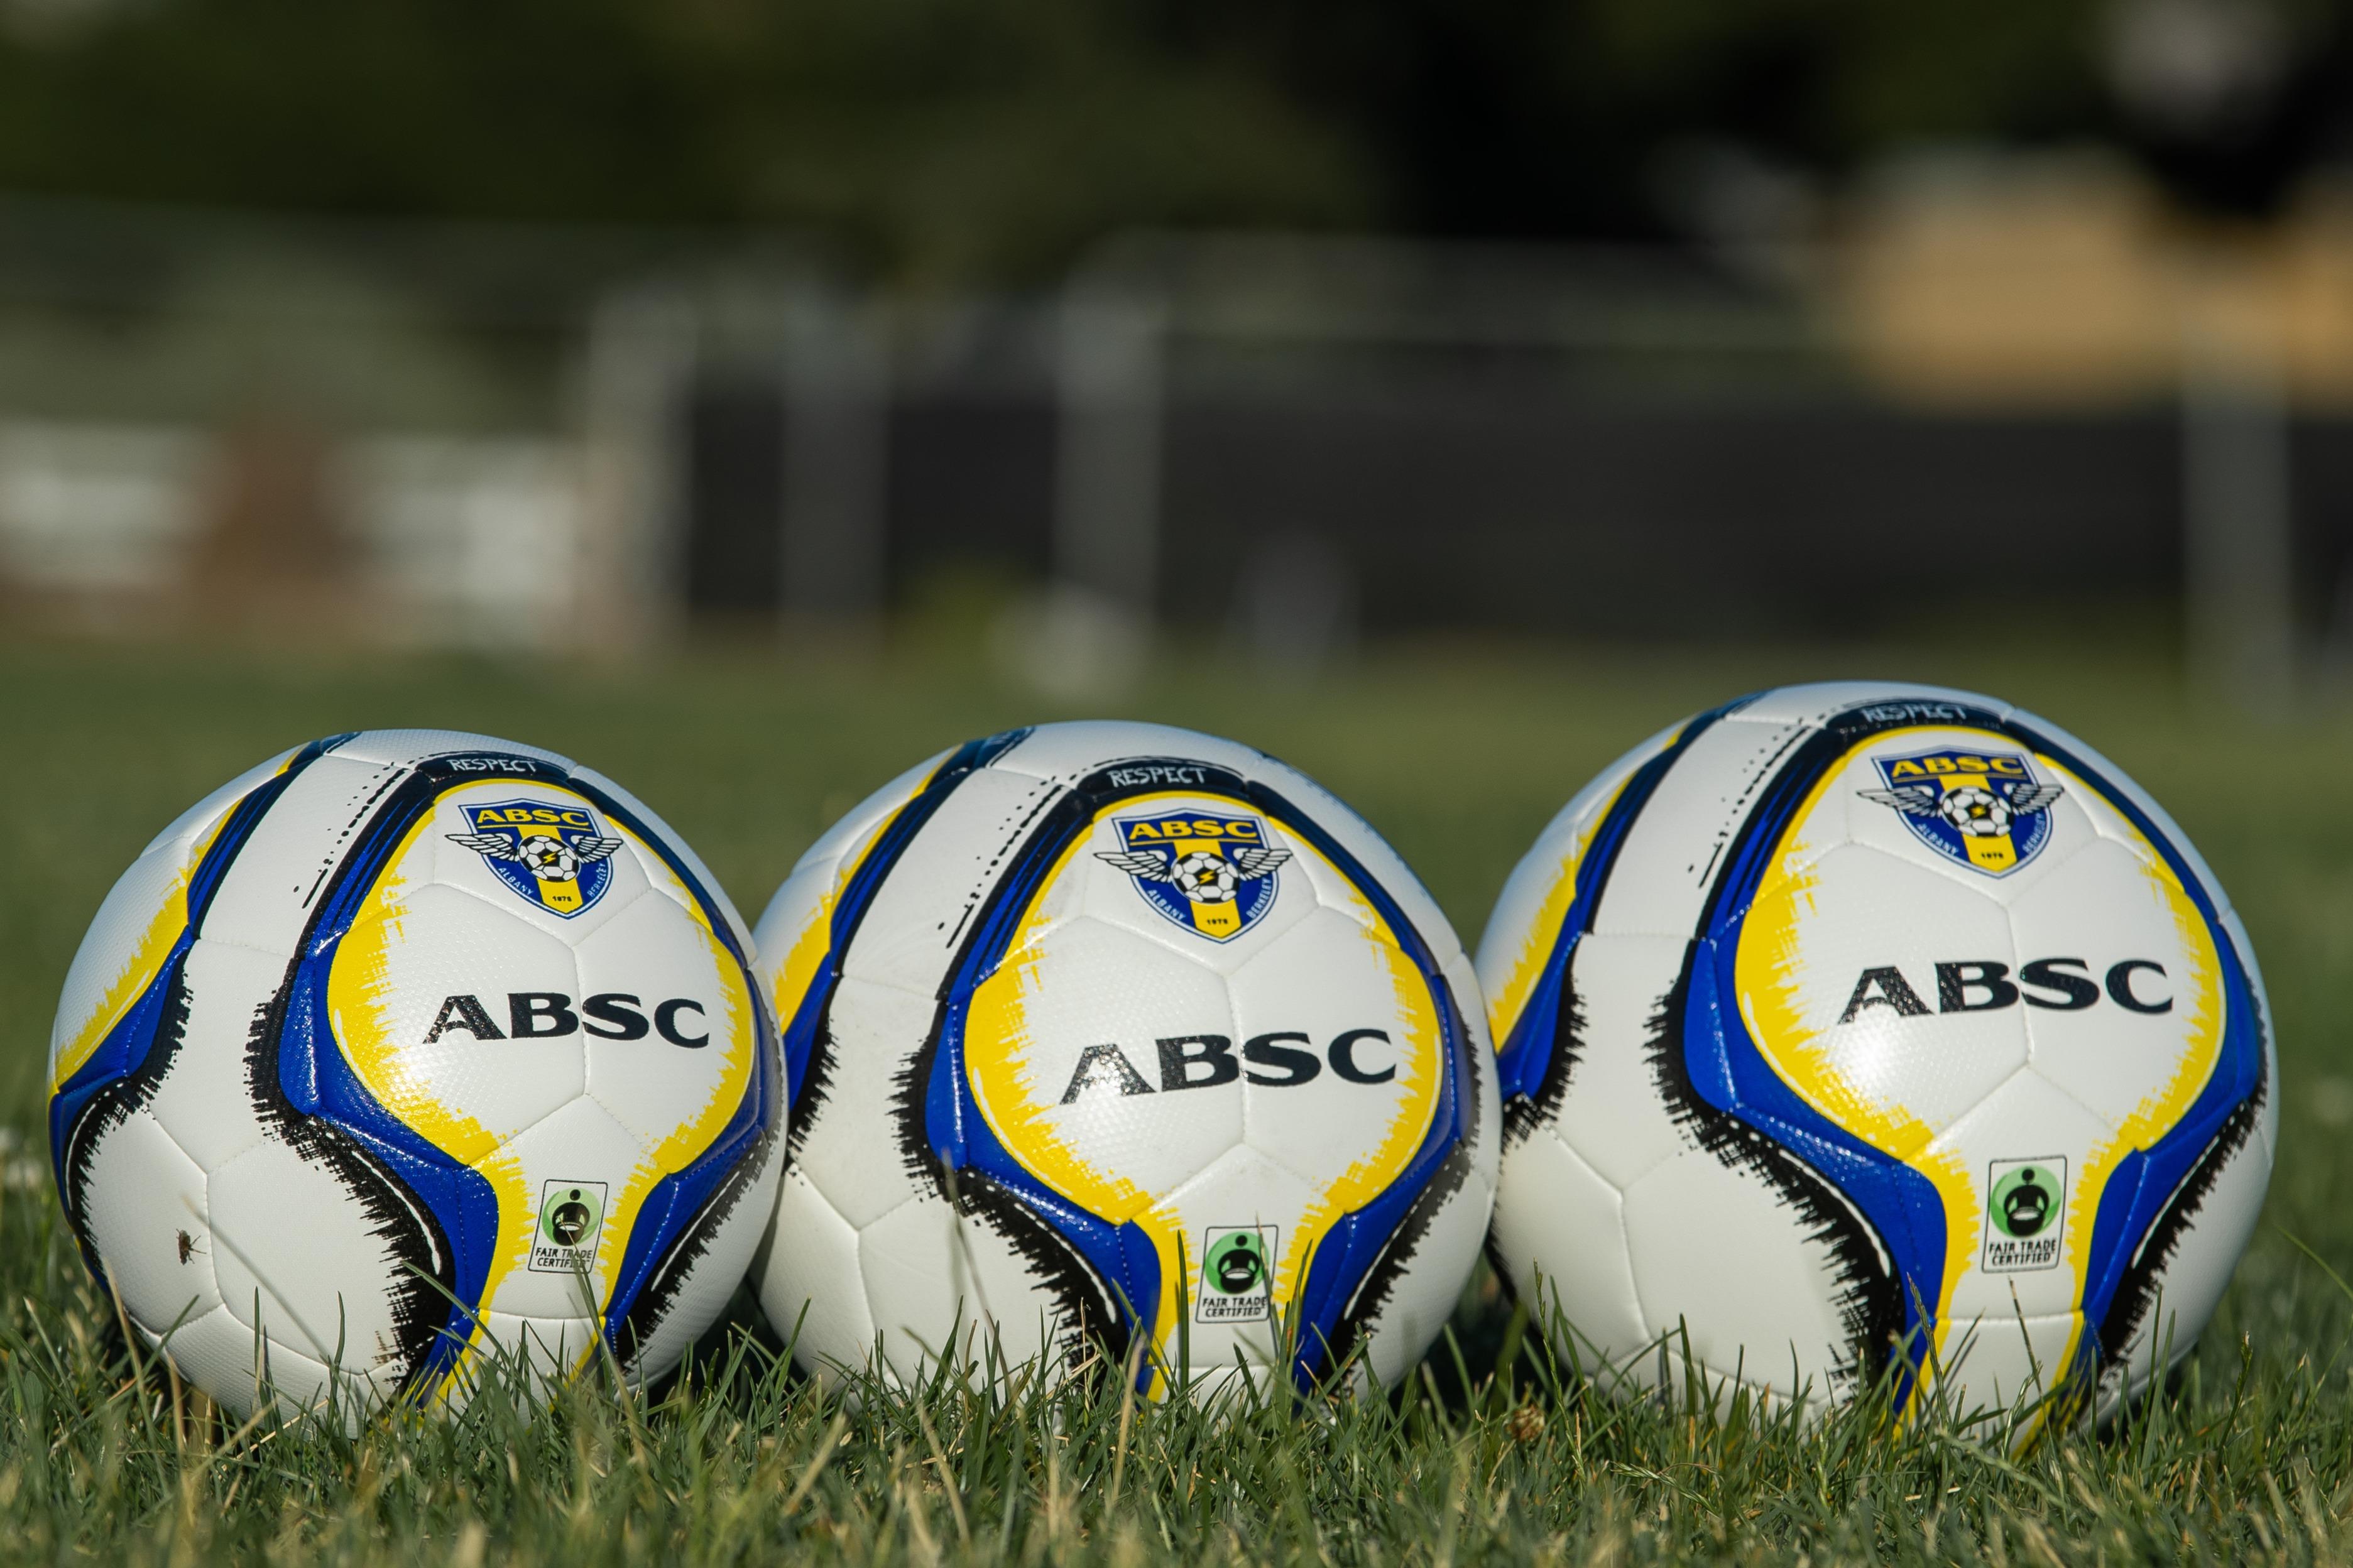 Albany-Berkley-SC x Senda Amador Ball